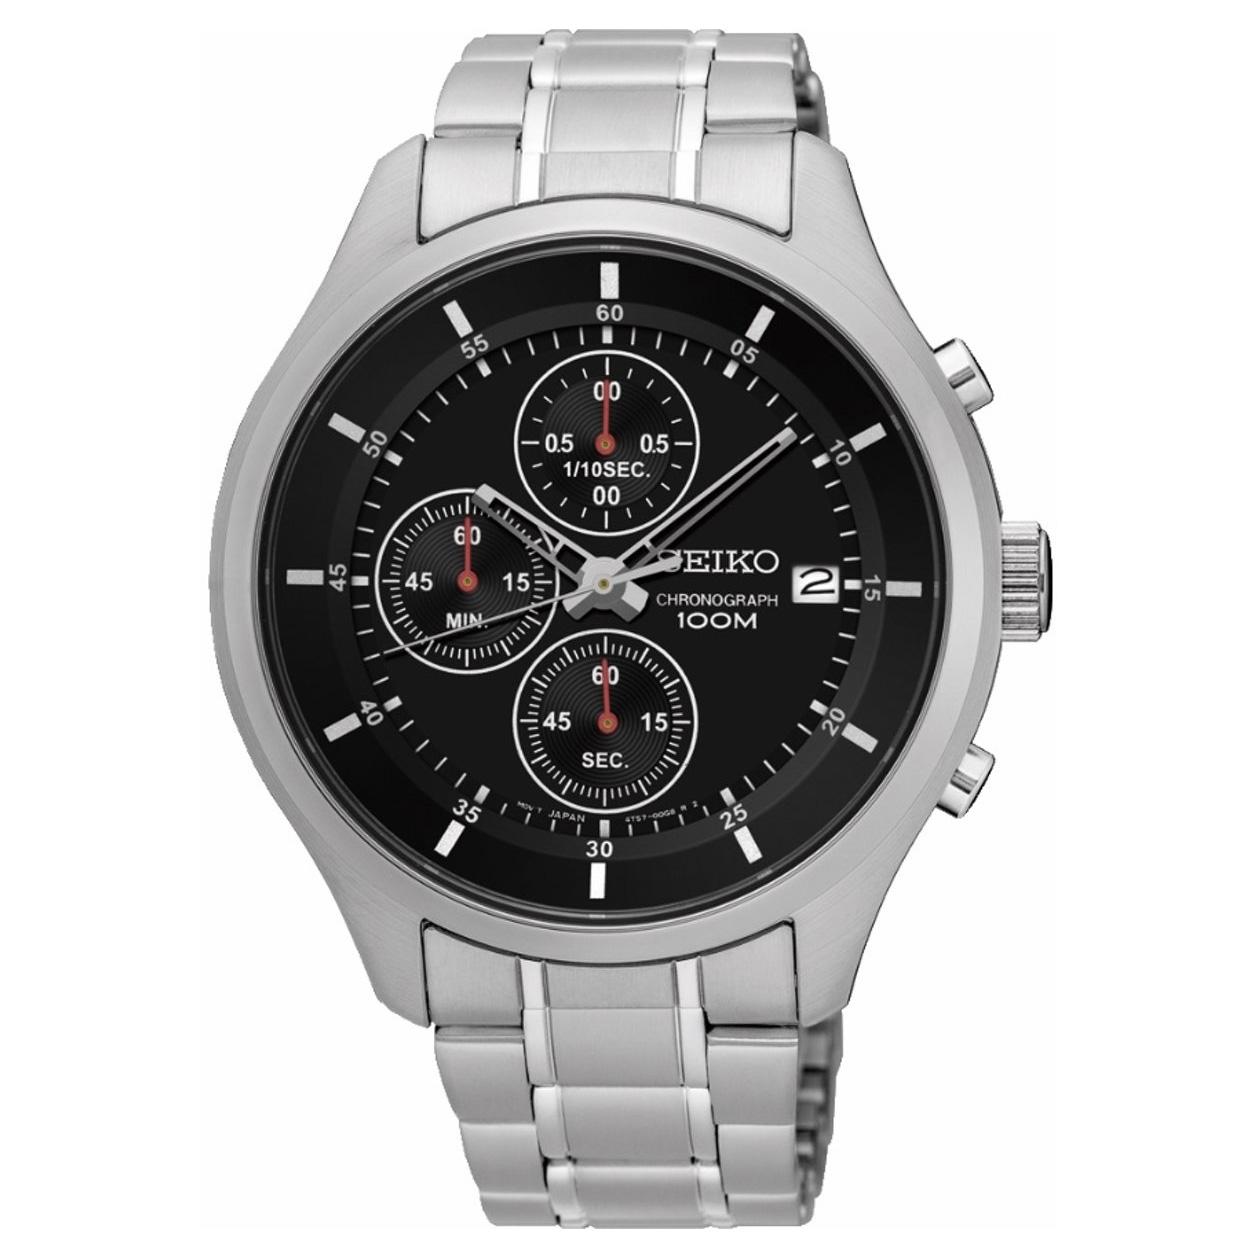 Seiko SKS539P1 Herenhorloge chronograaf Limited Edition staal 43 mm